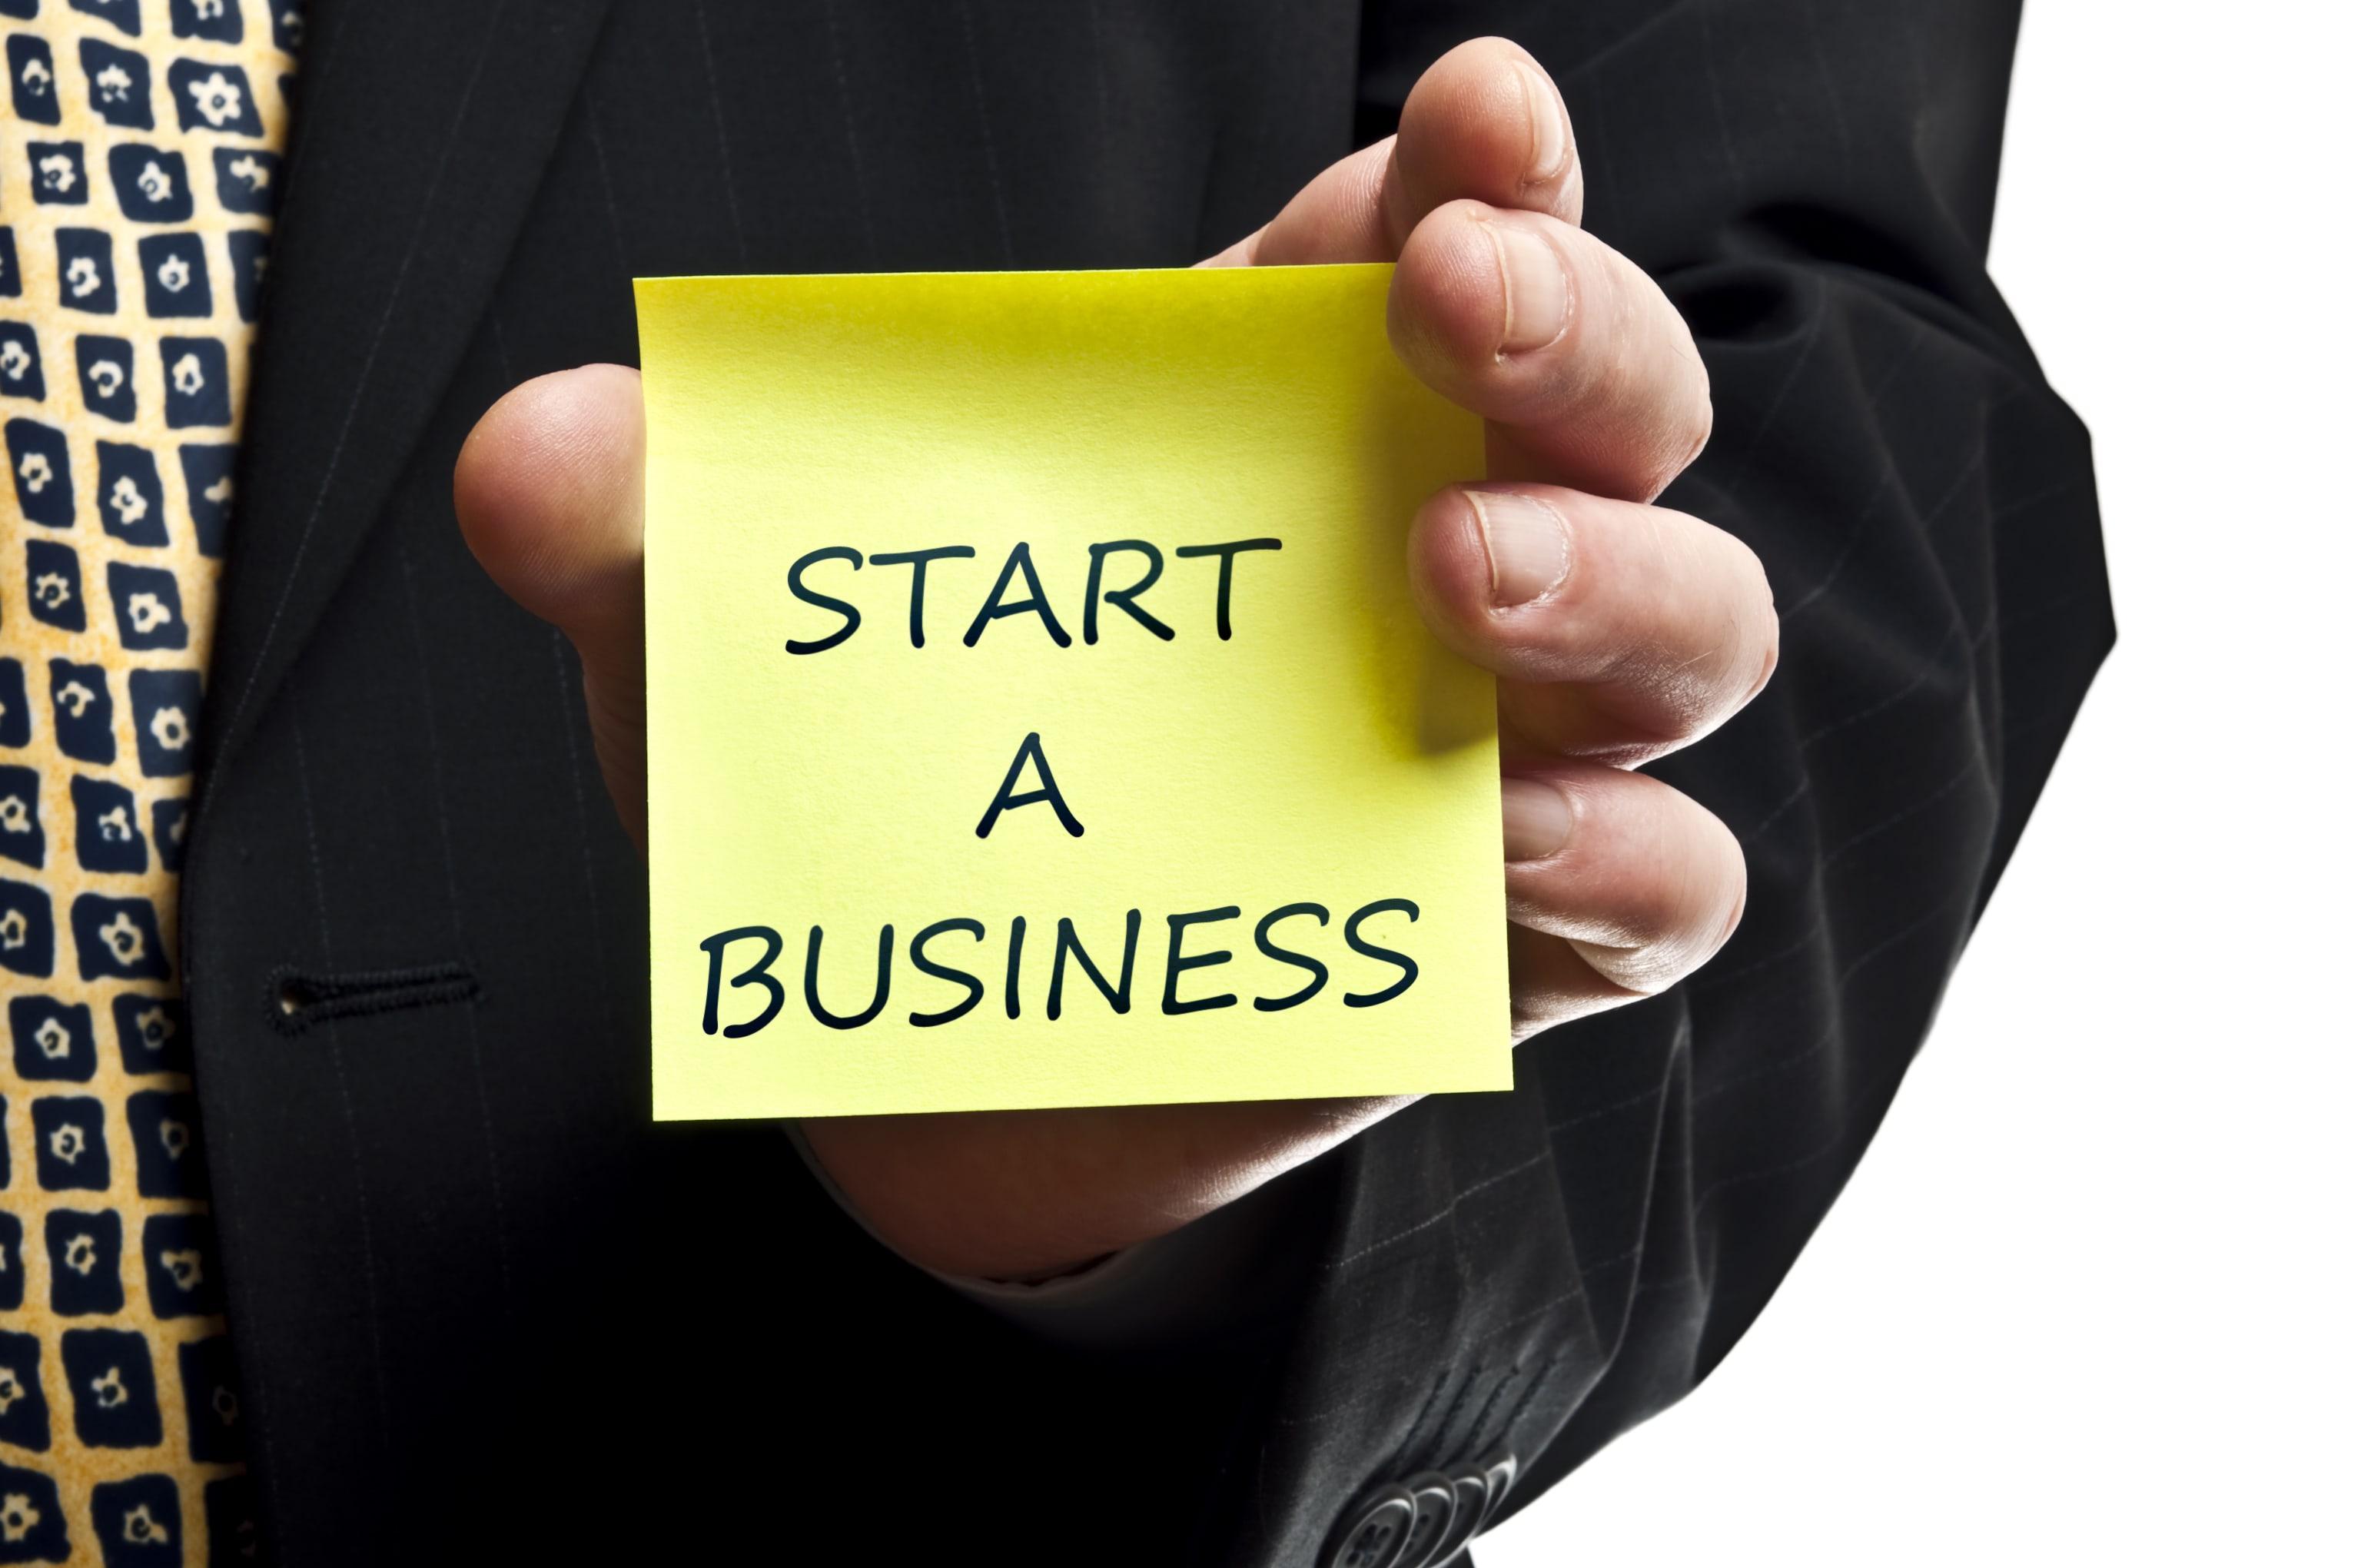 ce sa faci inainte de a incepe o afacere